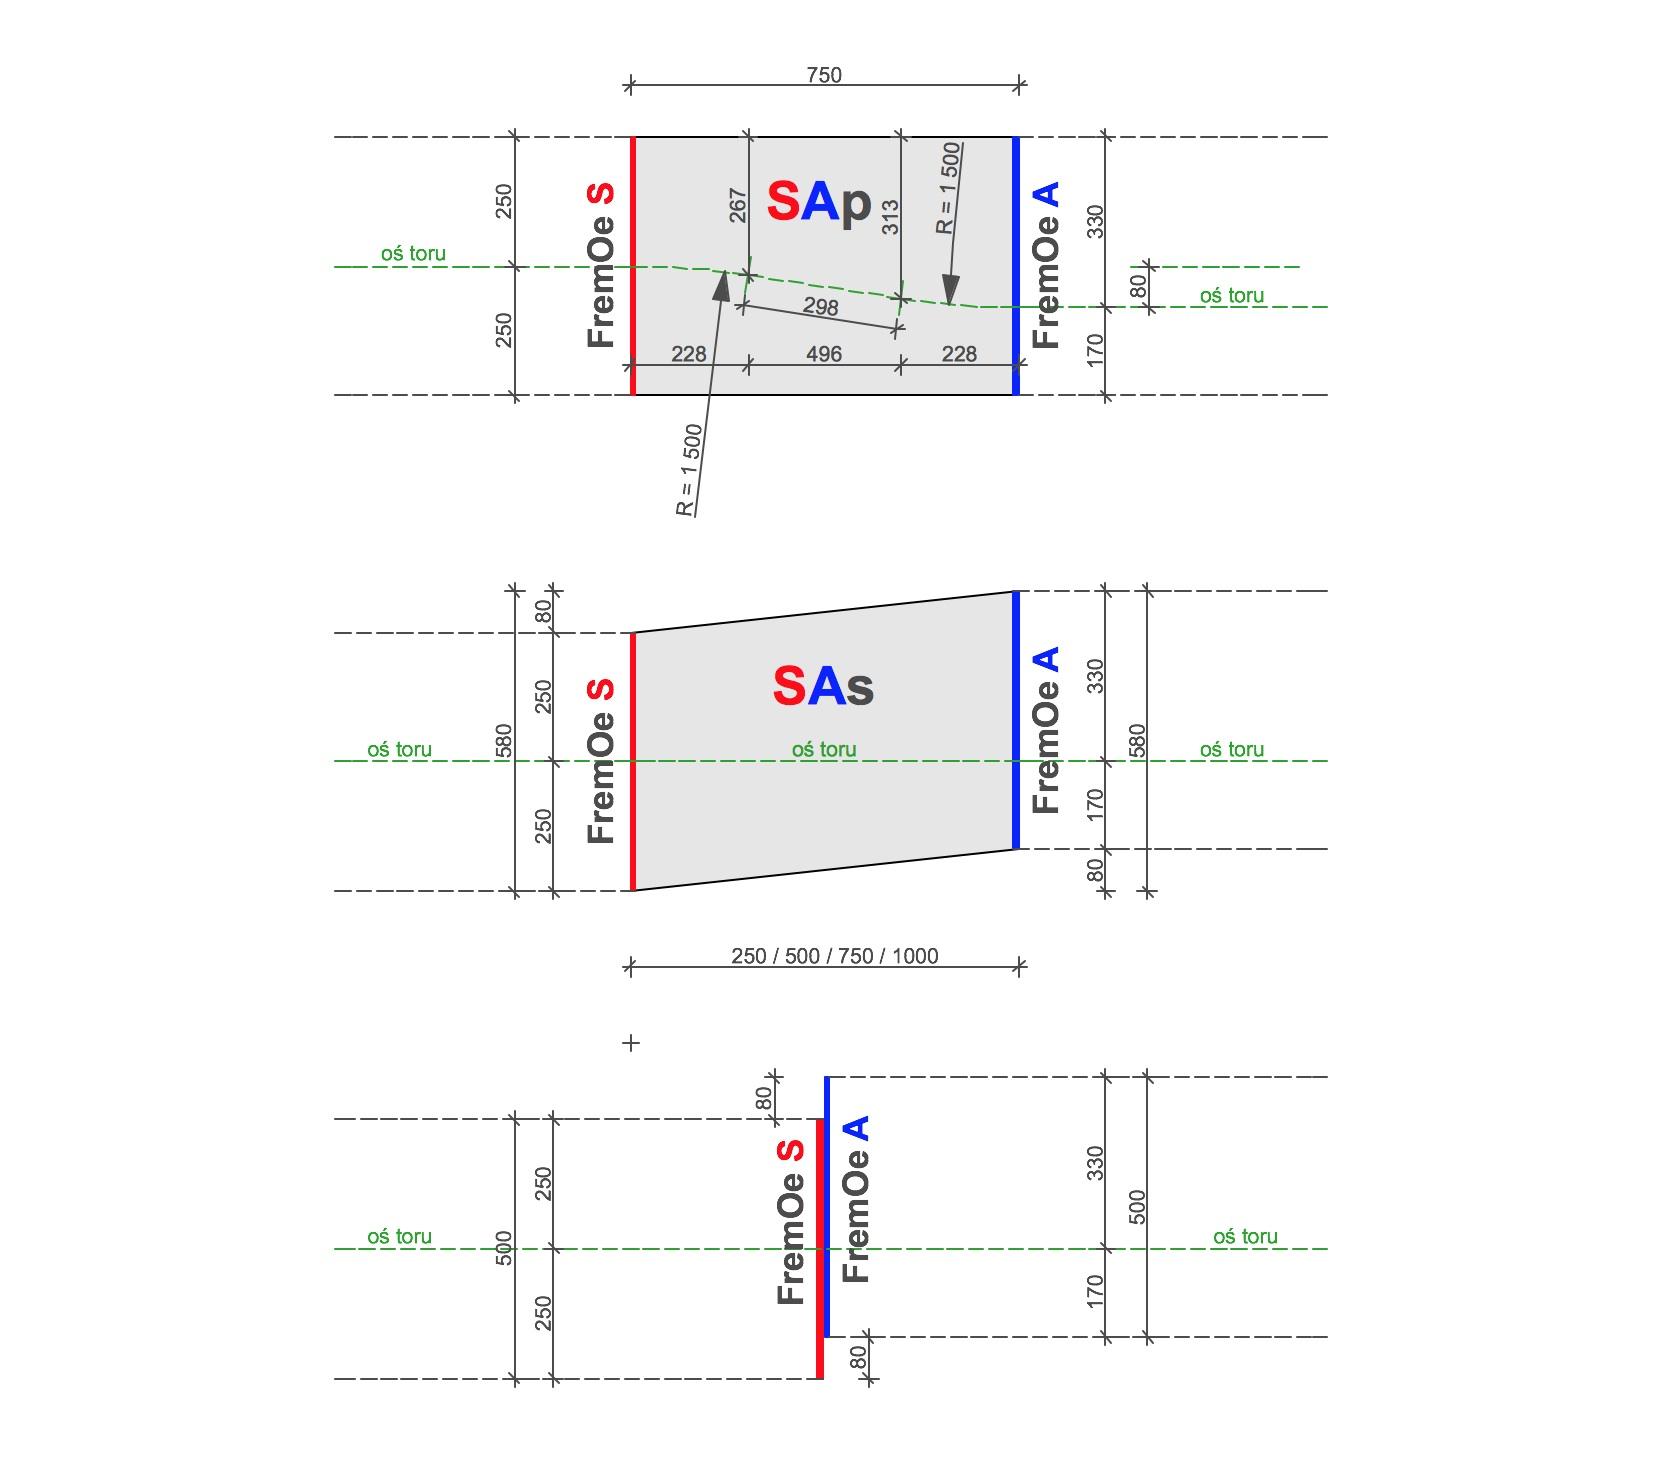 Moduły SAp SAs 0e.jpg